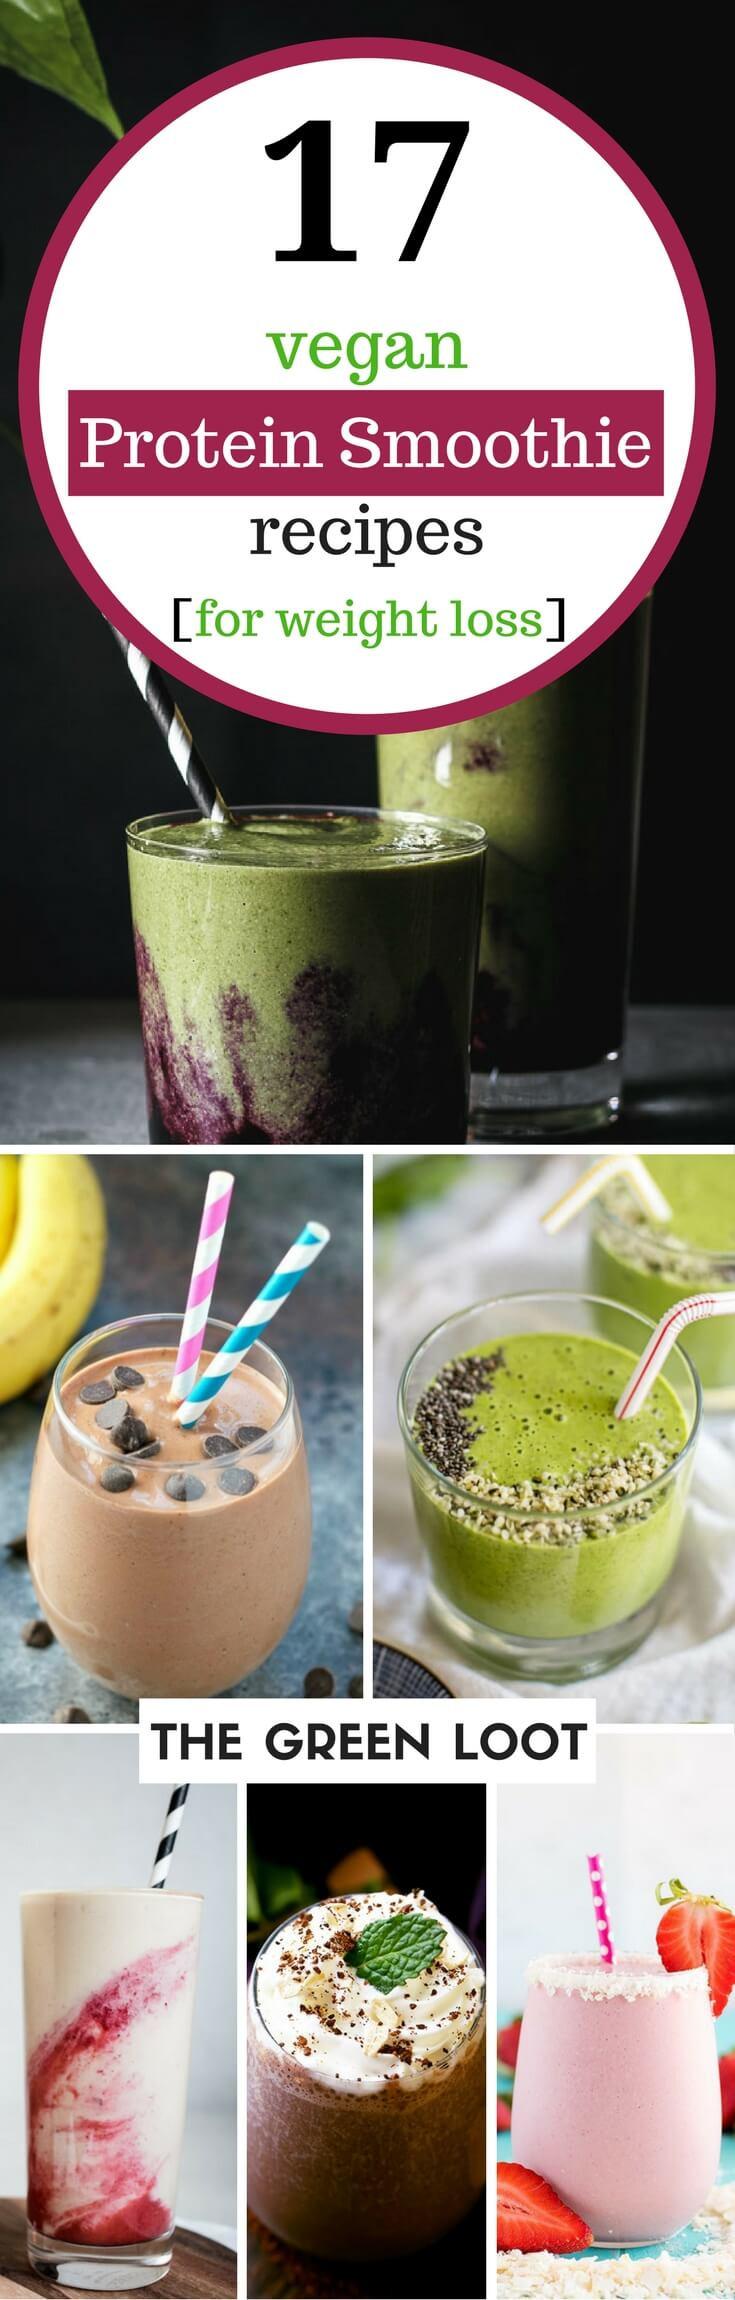 Vegan Protein Smoothie Without Powder  17 Tasty Vegan Protein Smoothie Recipes for Weight Loss